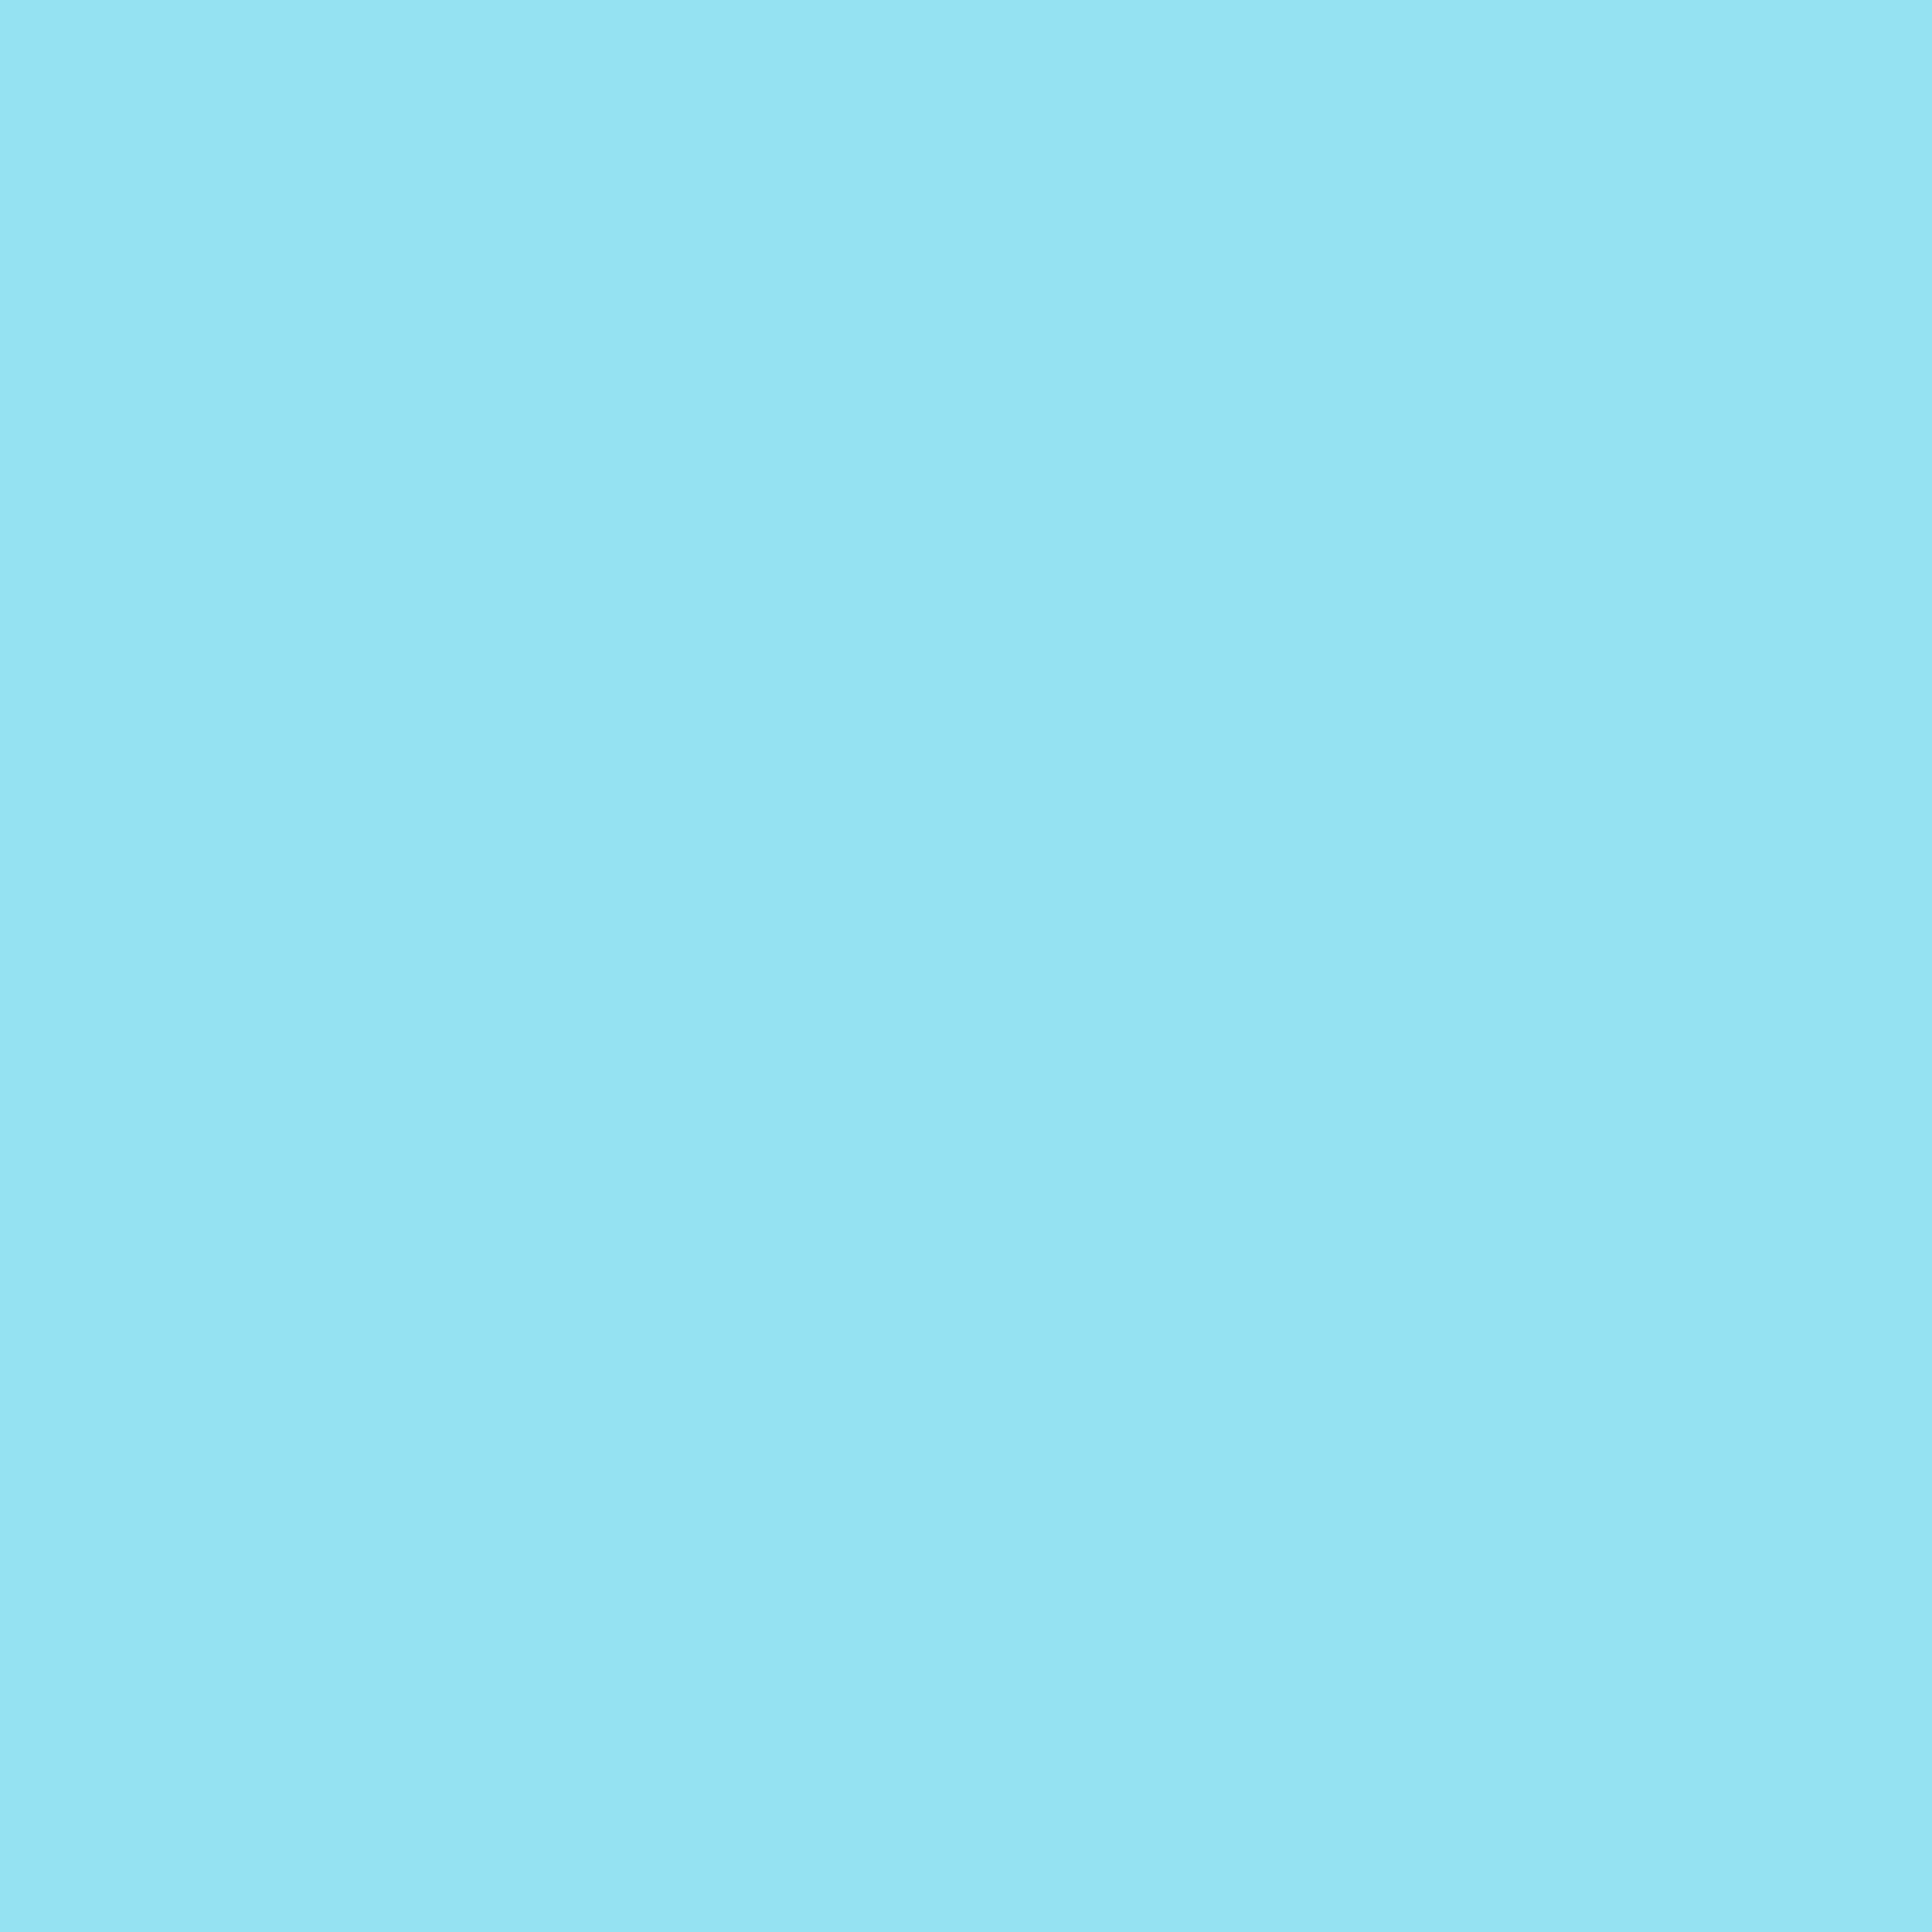 Blue, Daphne